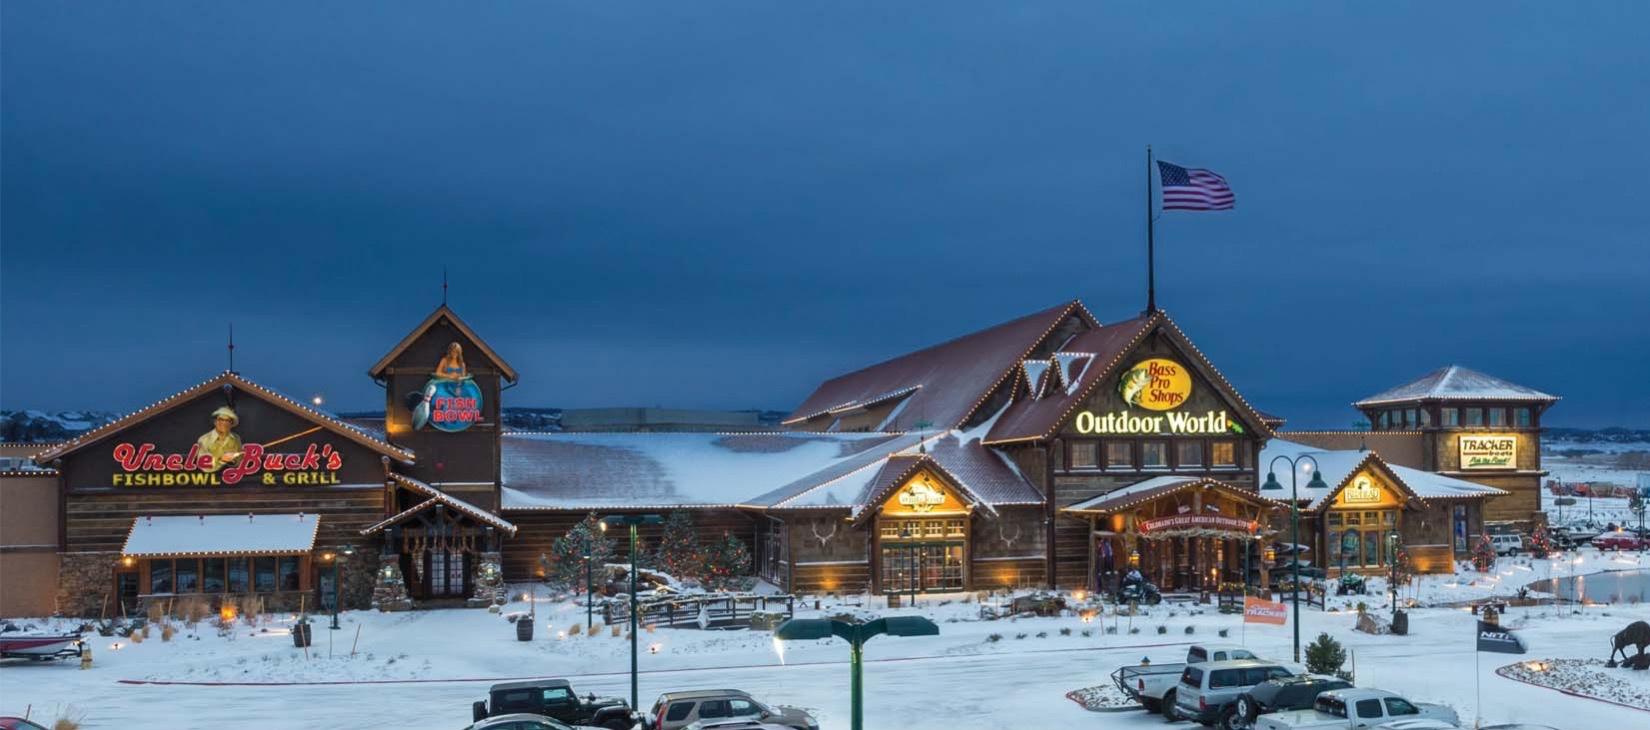 BPS-Colorado-Springs-Photo-21.jpg